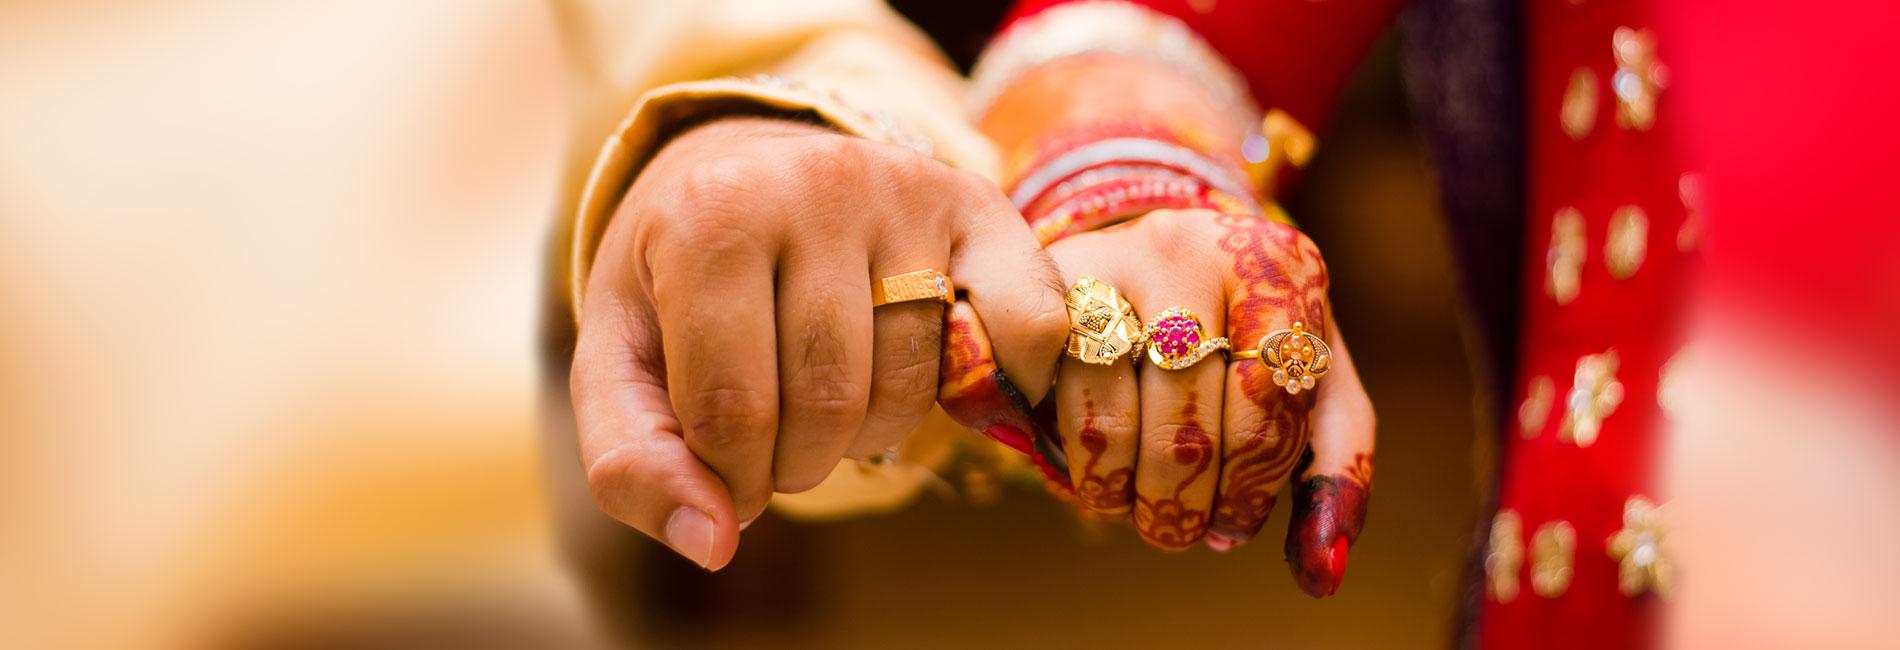 PunjabKesari, लव मैरिज, Love marriage